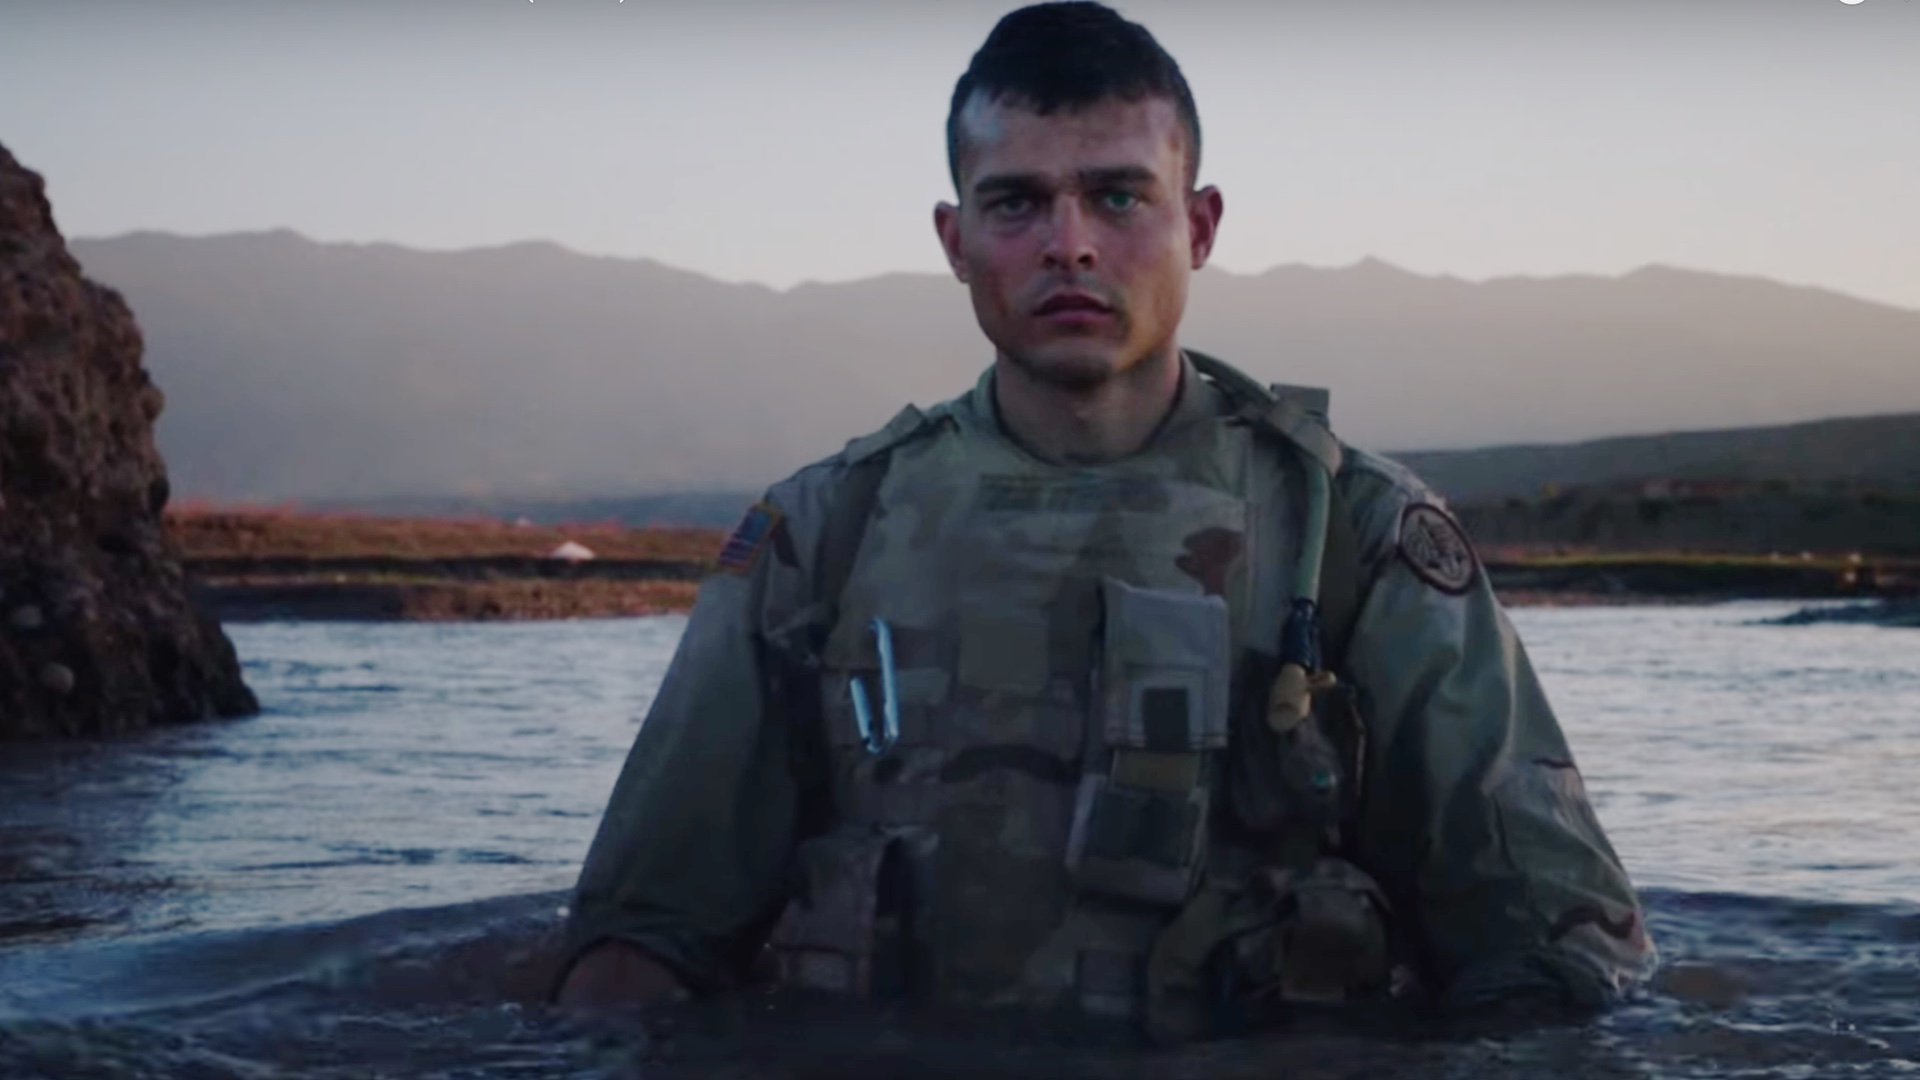 intense-trailer-for-the-war-thriller-the-yellow-birds-with-alden-ehrenreich-and-tye-sheridan-social.jpg